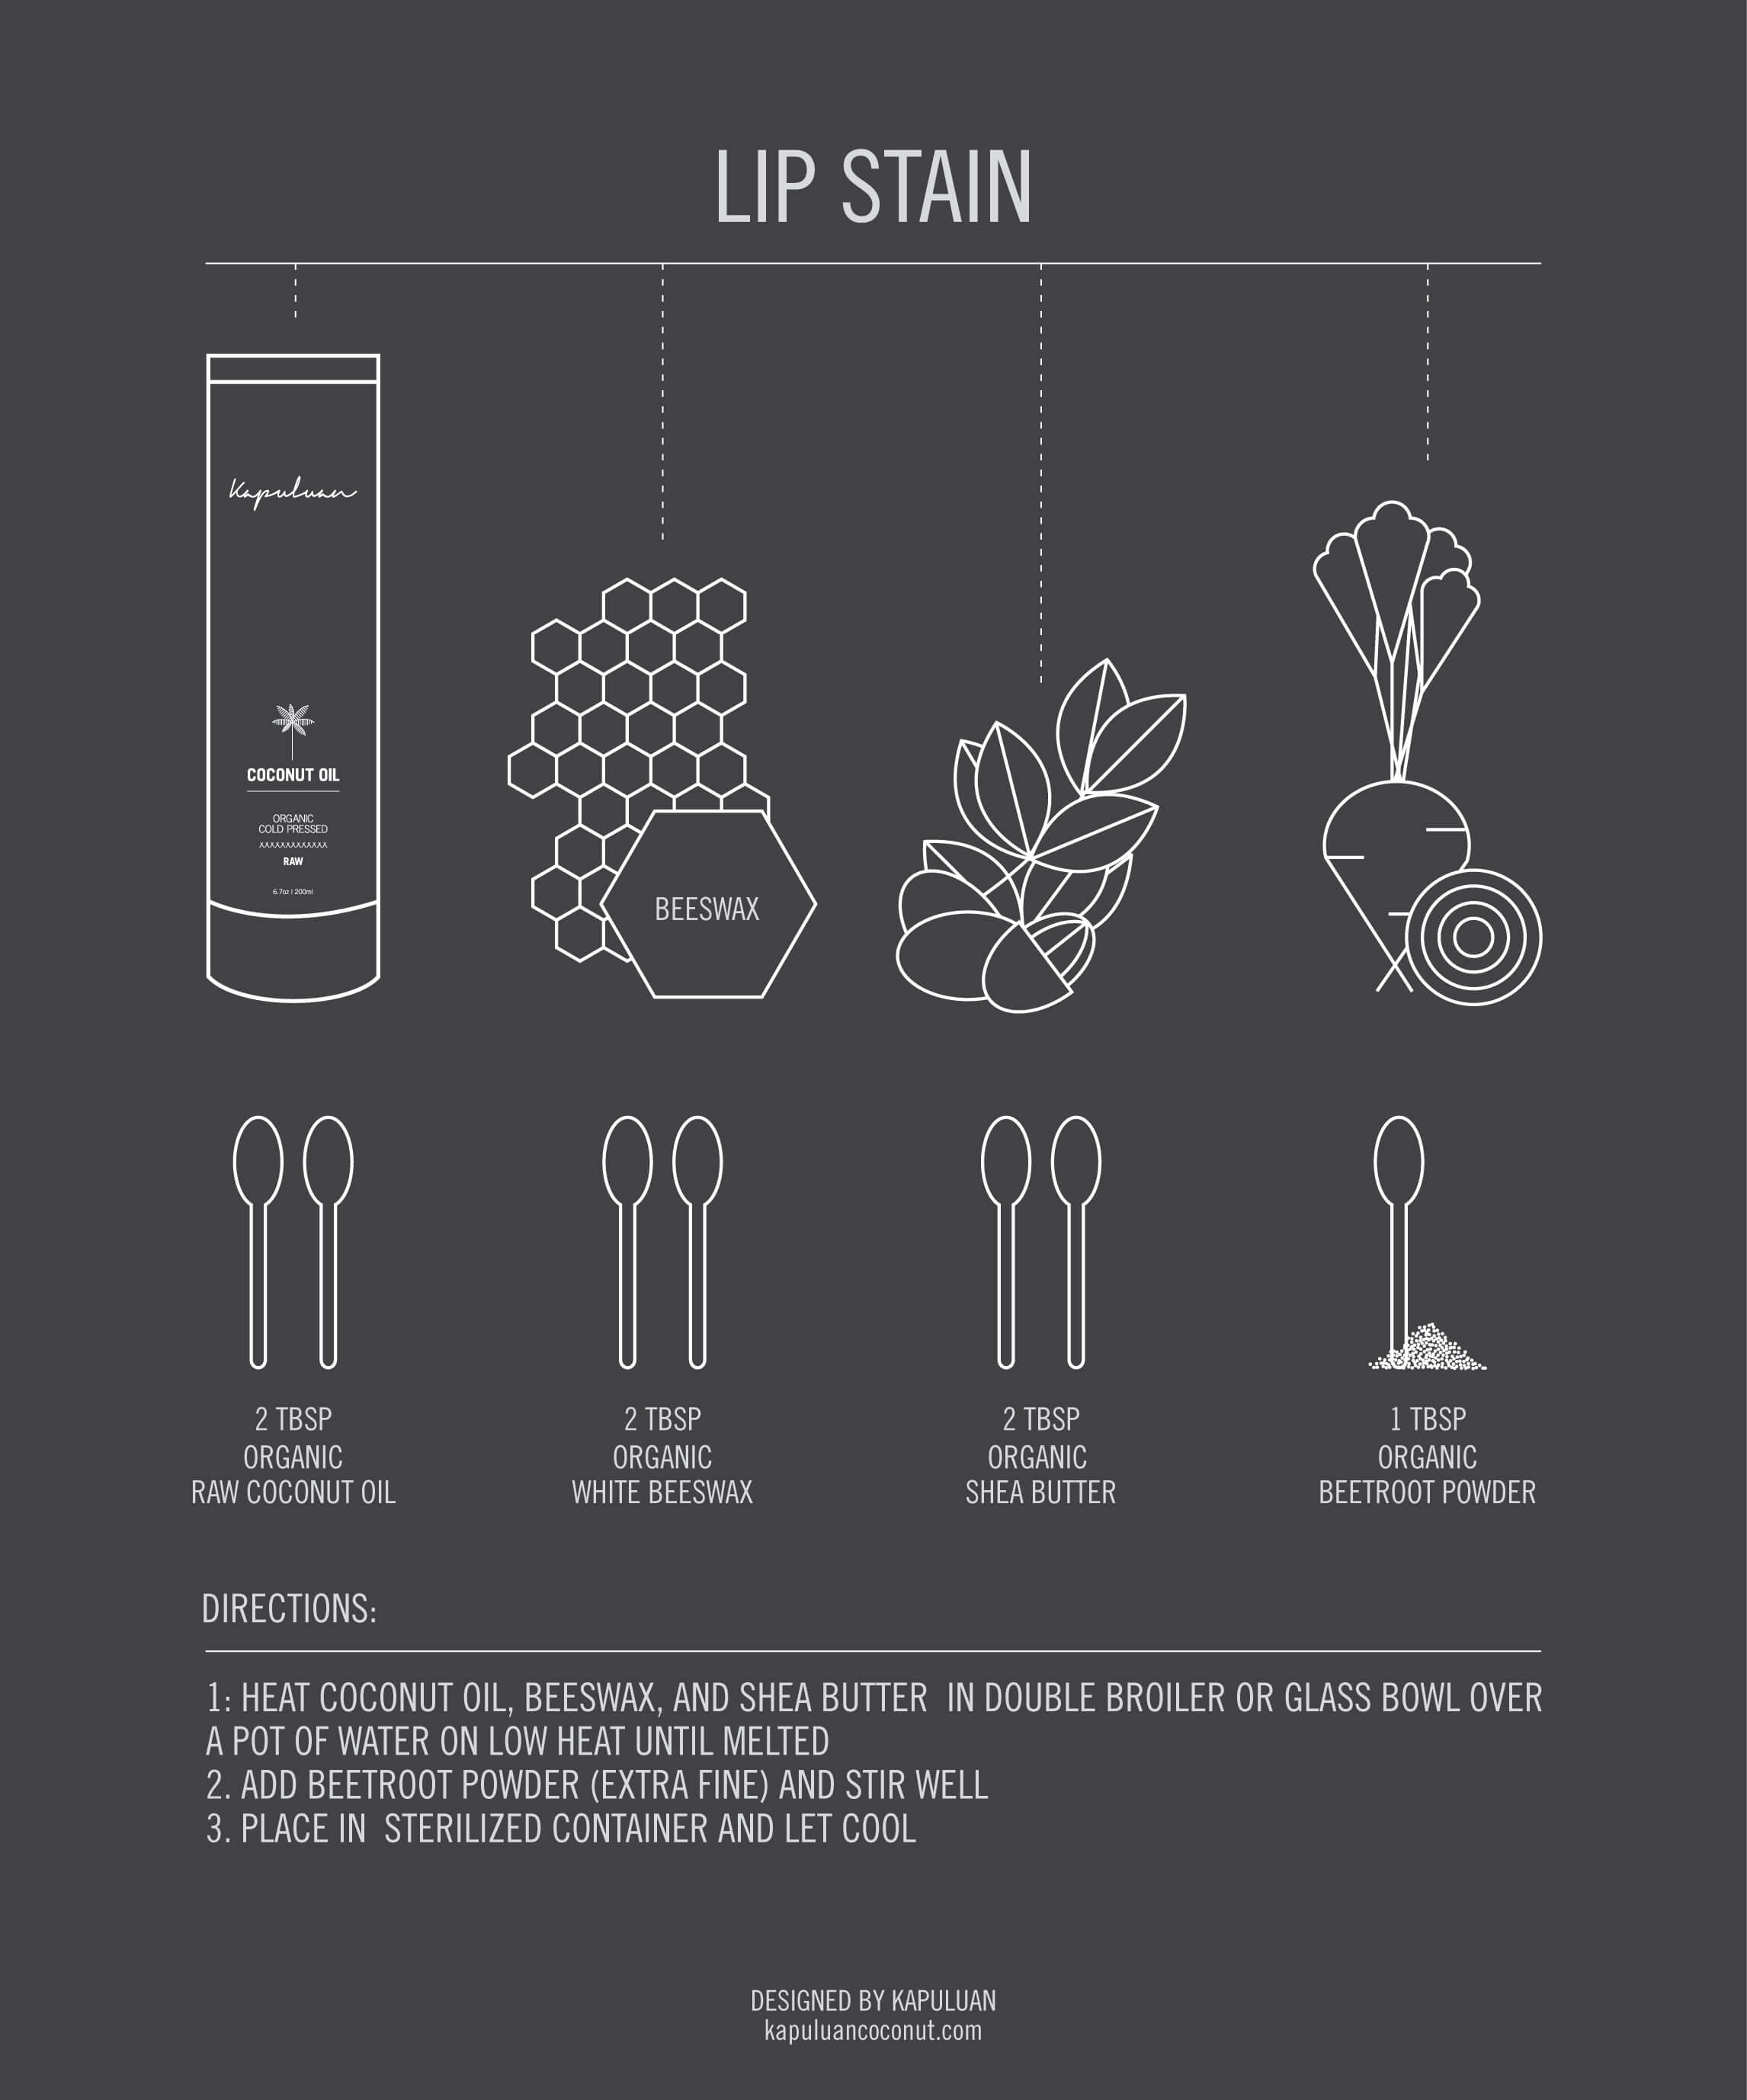 Kapuluan Coconut Oil's Lip Tint Recipe Infographic